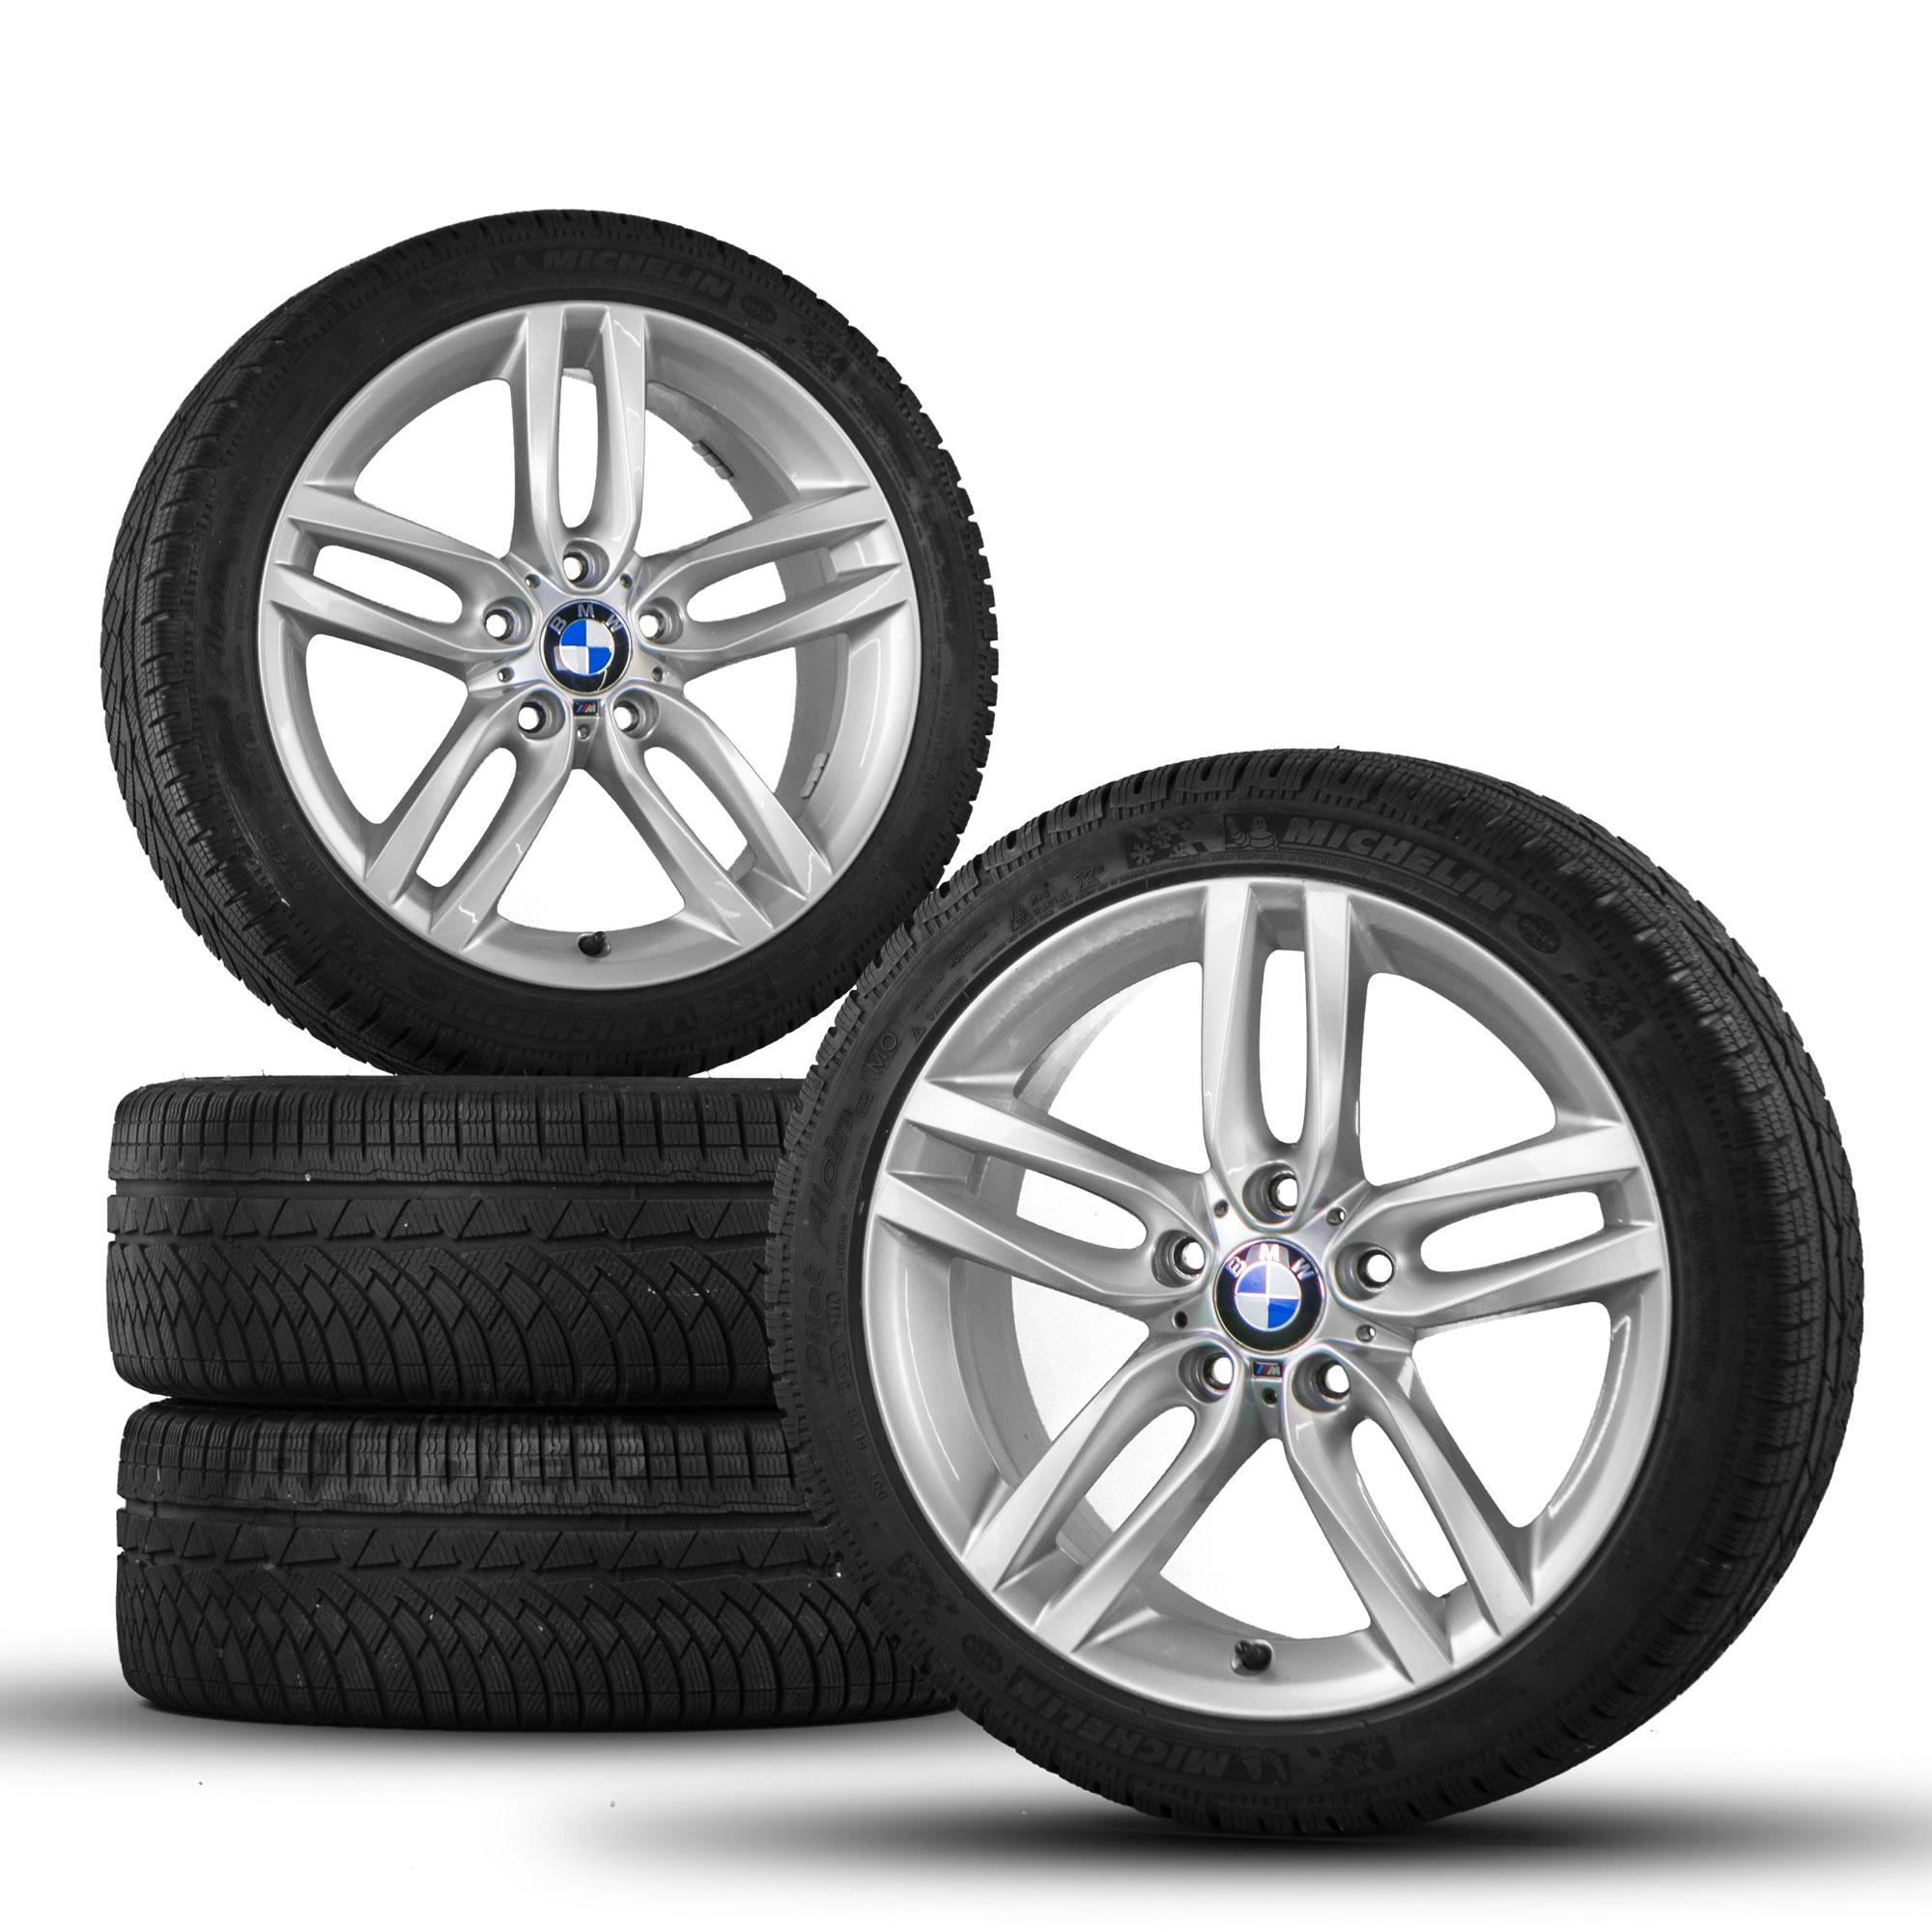 BMW 18 Inch Rims 2 Series F22 F23 M461 M 461 Alloy Wheels